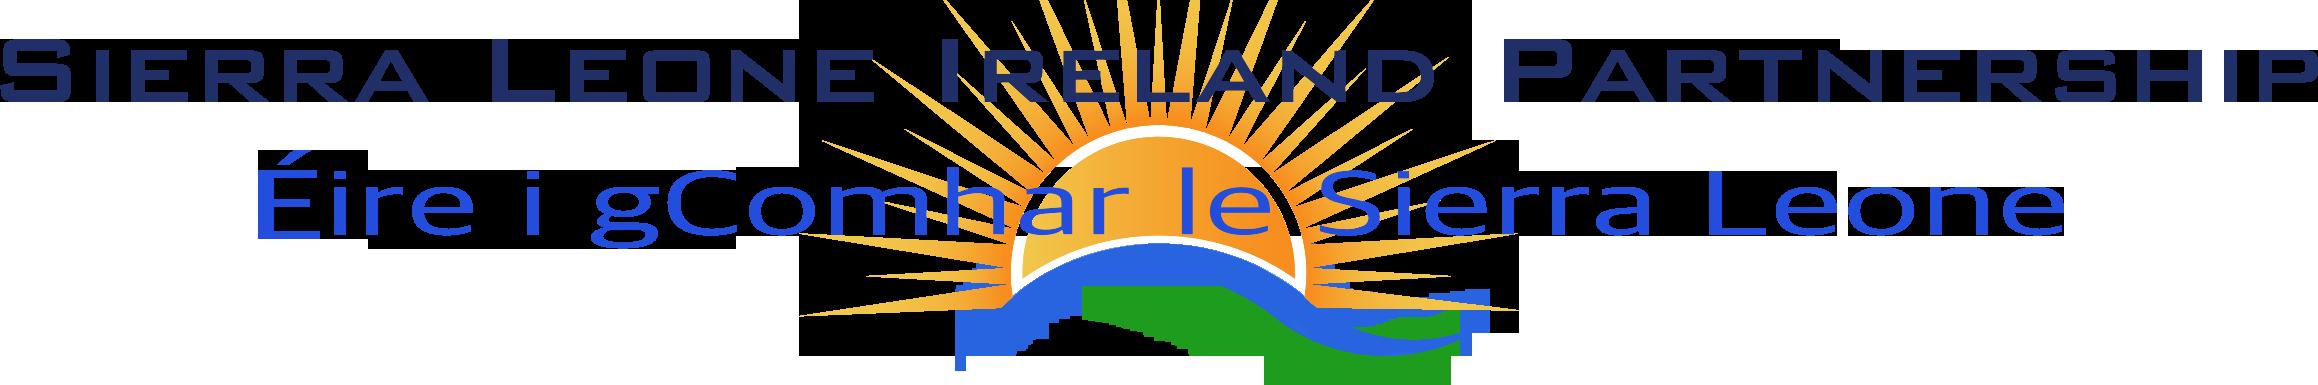 Slip sierra leone partnership ireland biocorpaavc